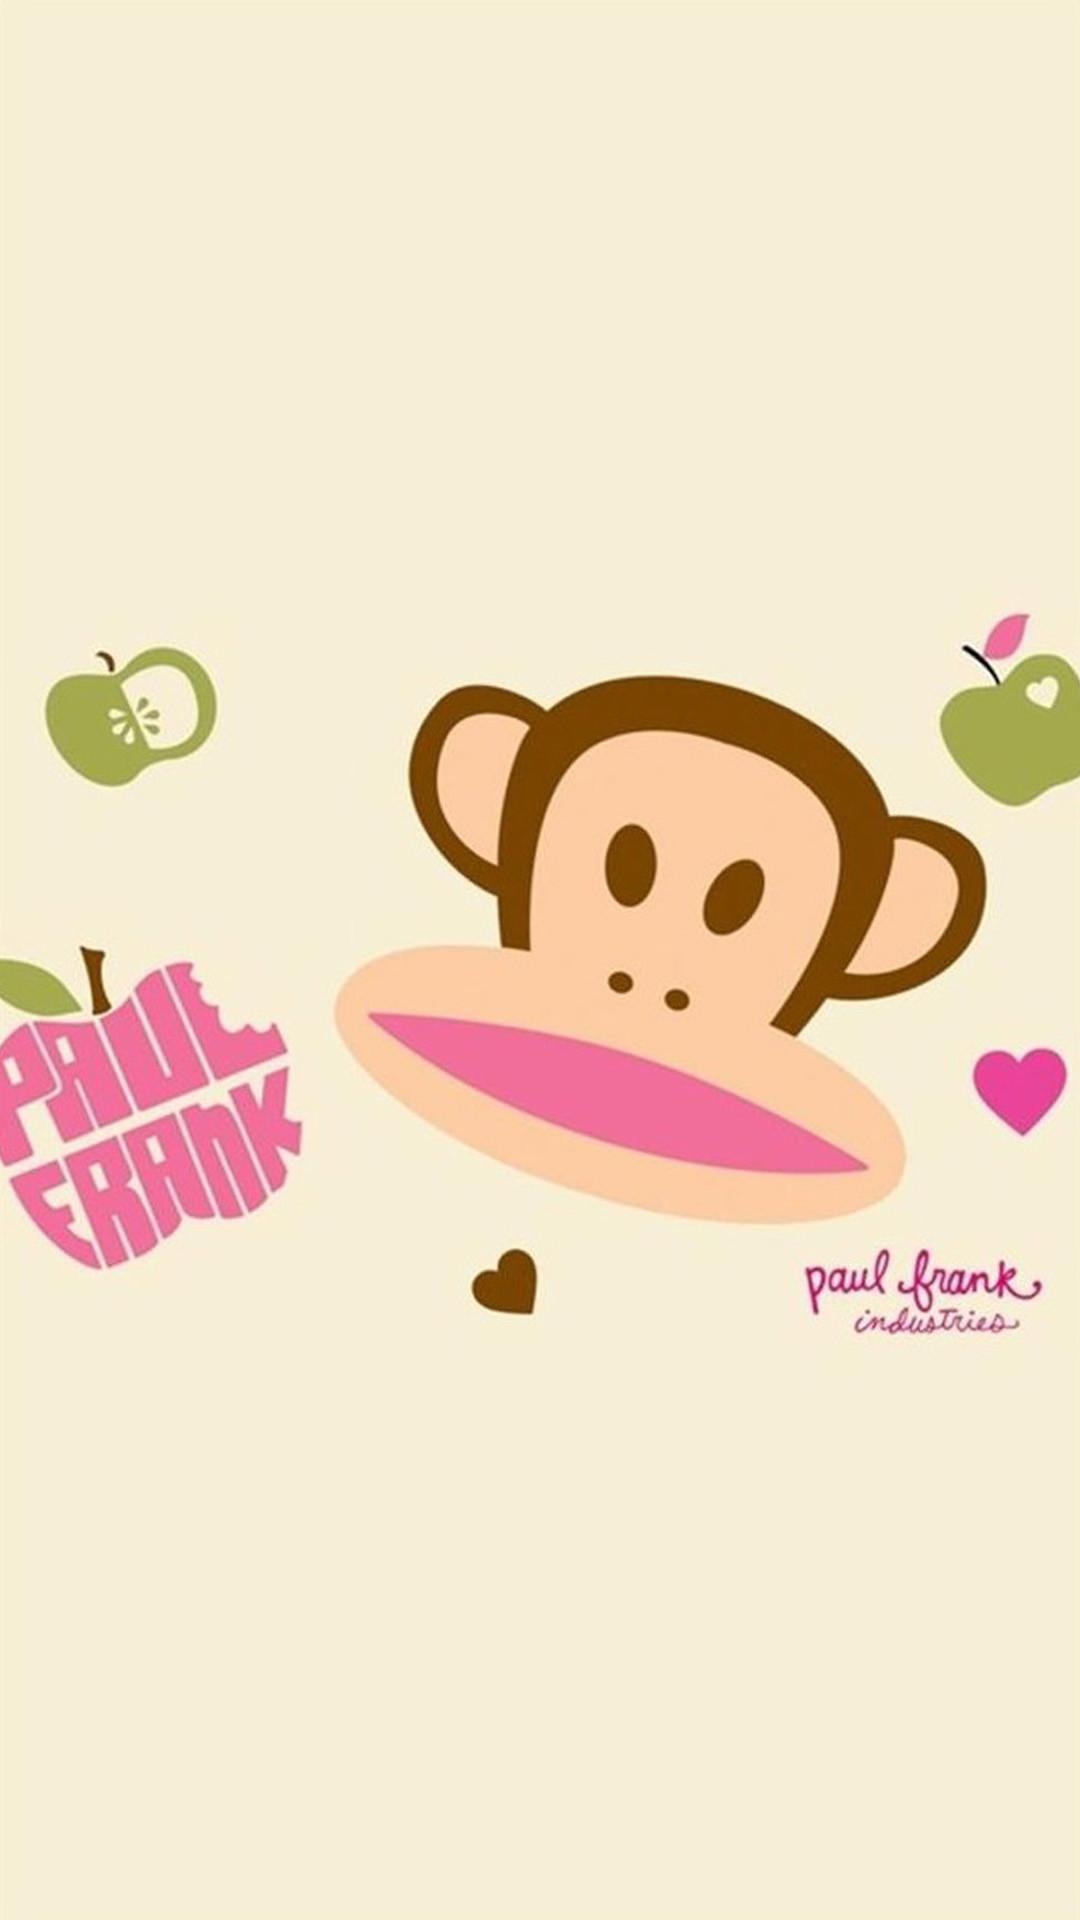 cute iphone wallpapers backgrounds girly plus kawaii emoji screensavers pretty kitty hello phone vertical anchor frank paul wallpapertag desktop monkey